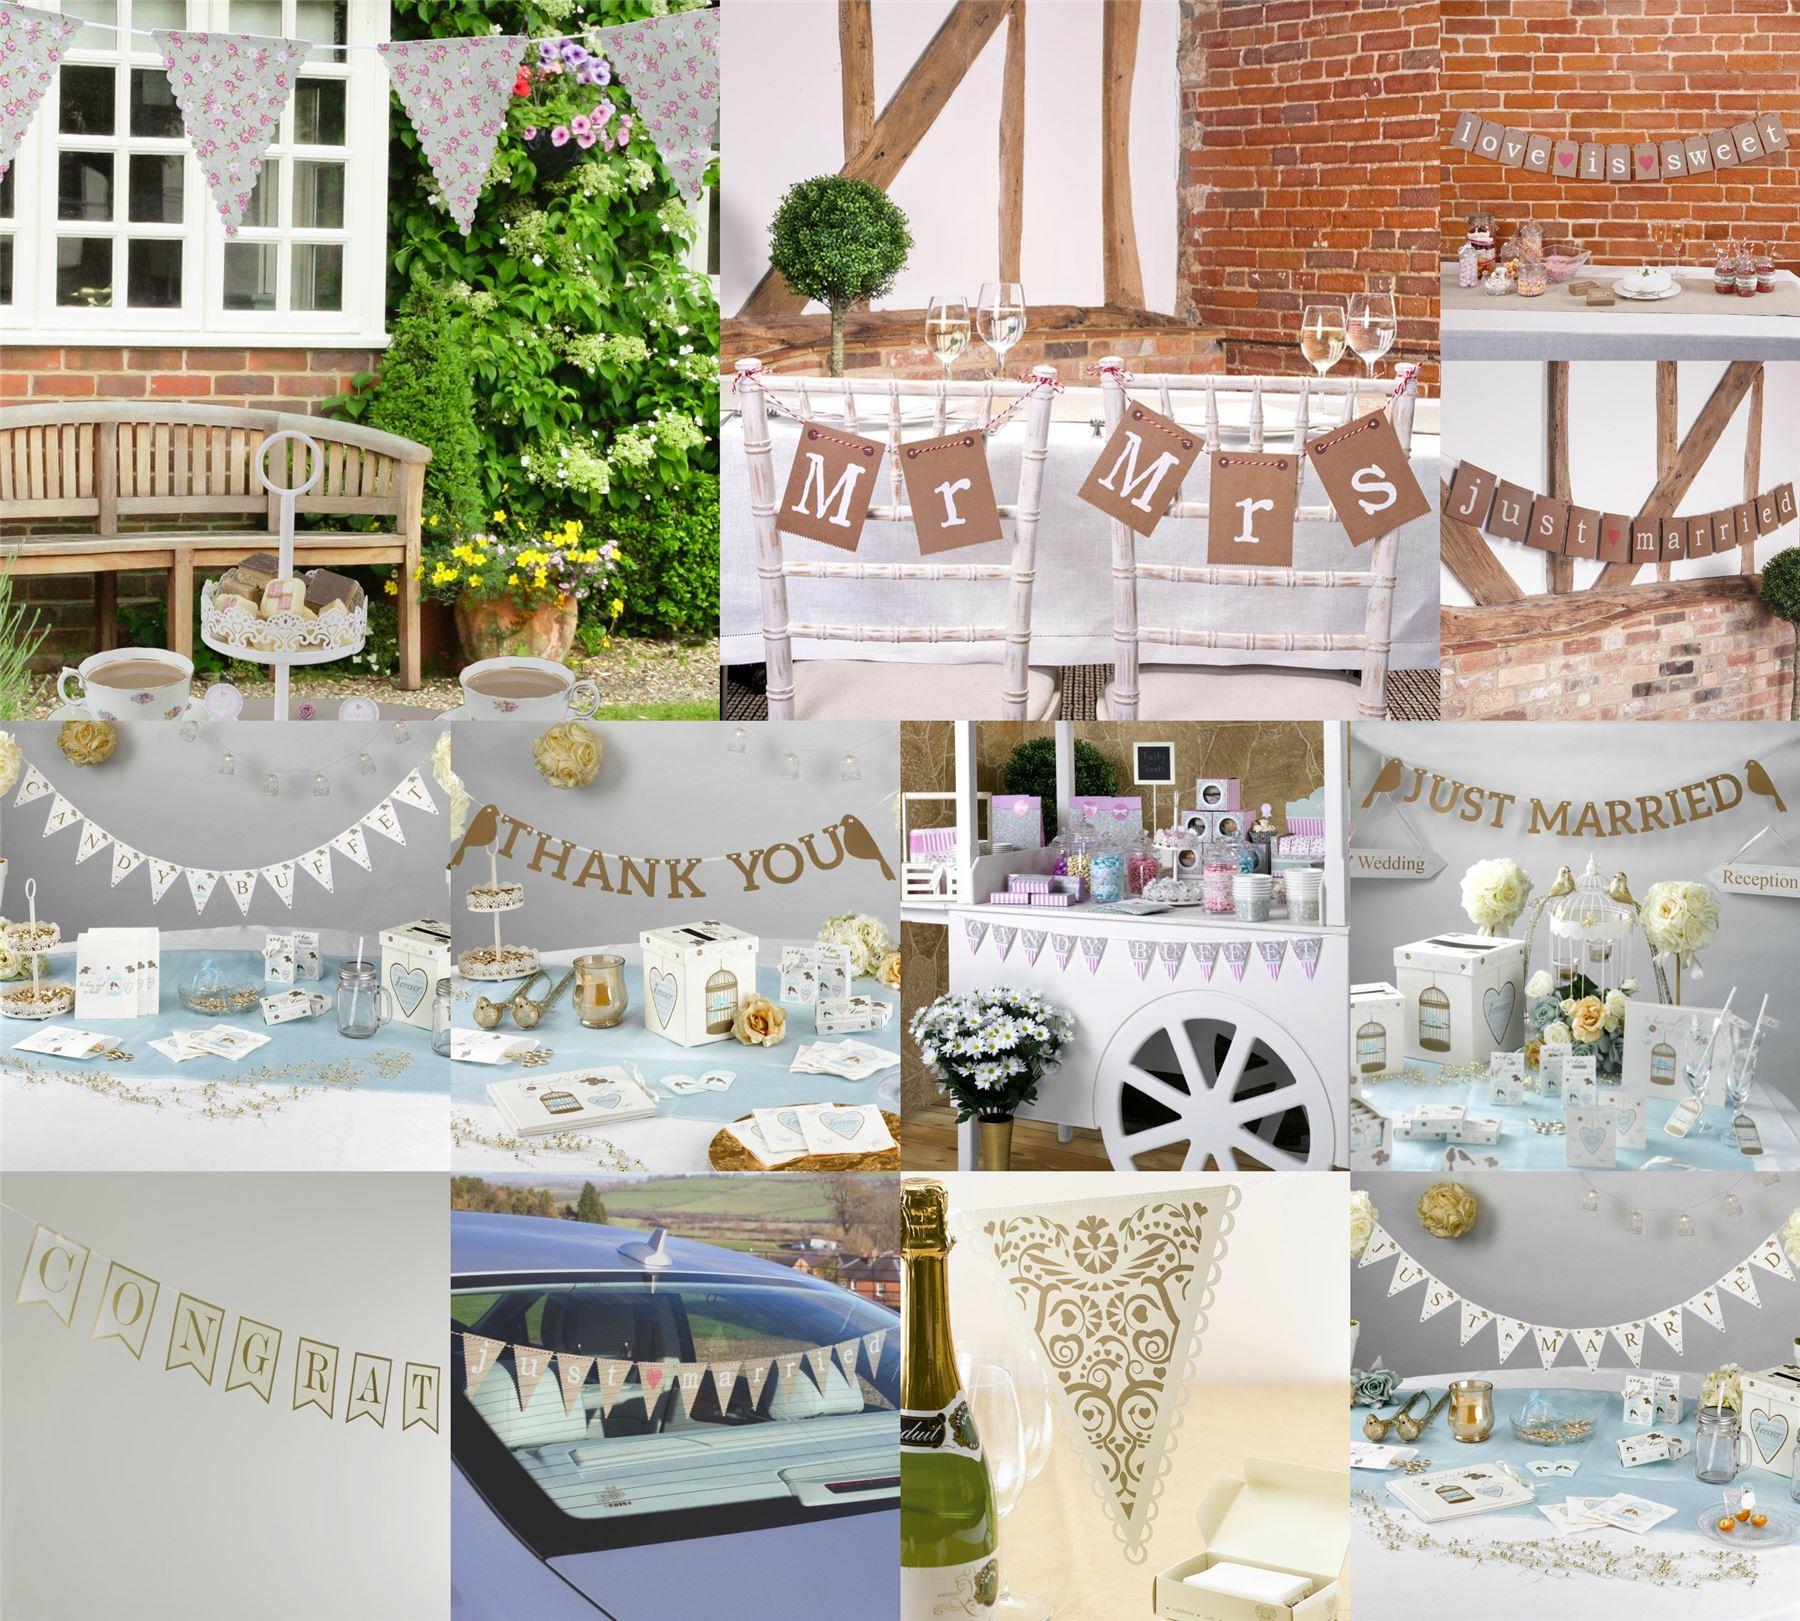 Wedding party bunting banner decorations vintage garland for Just married dekoration